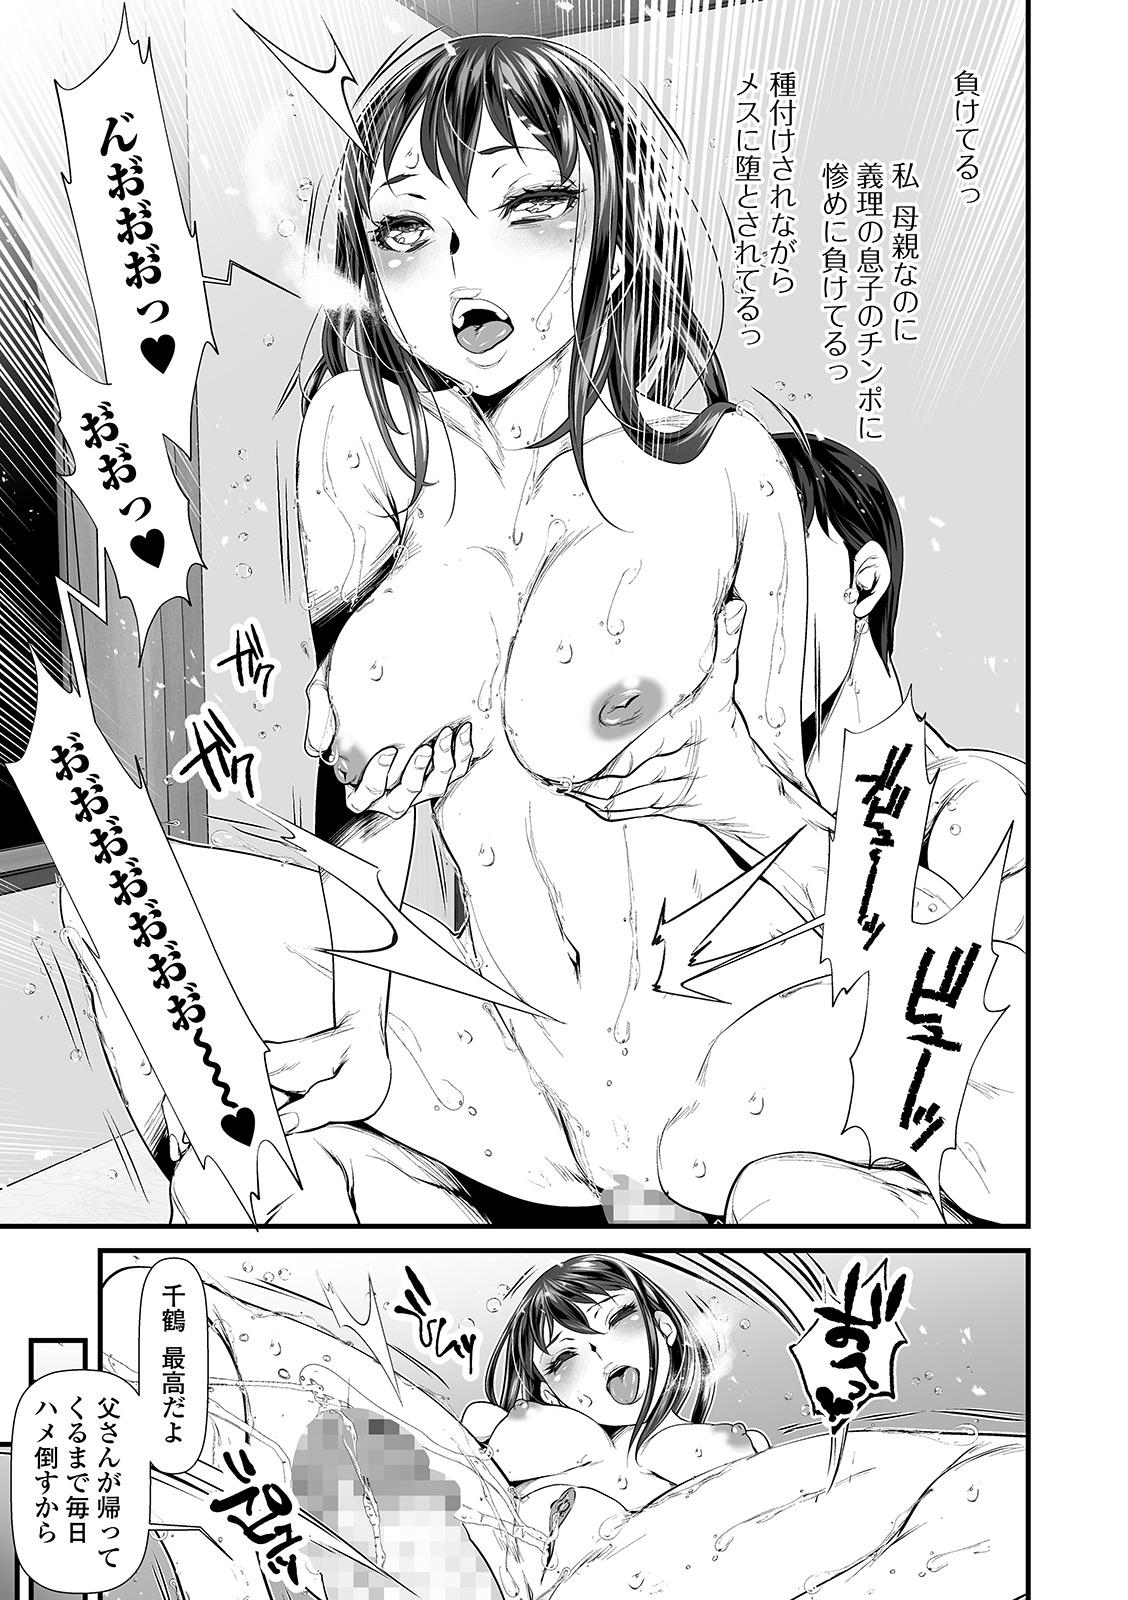 COMIC Shigekiteki SQUIRT!! Vol. 15 28